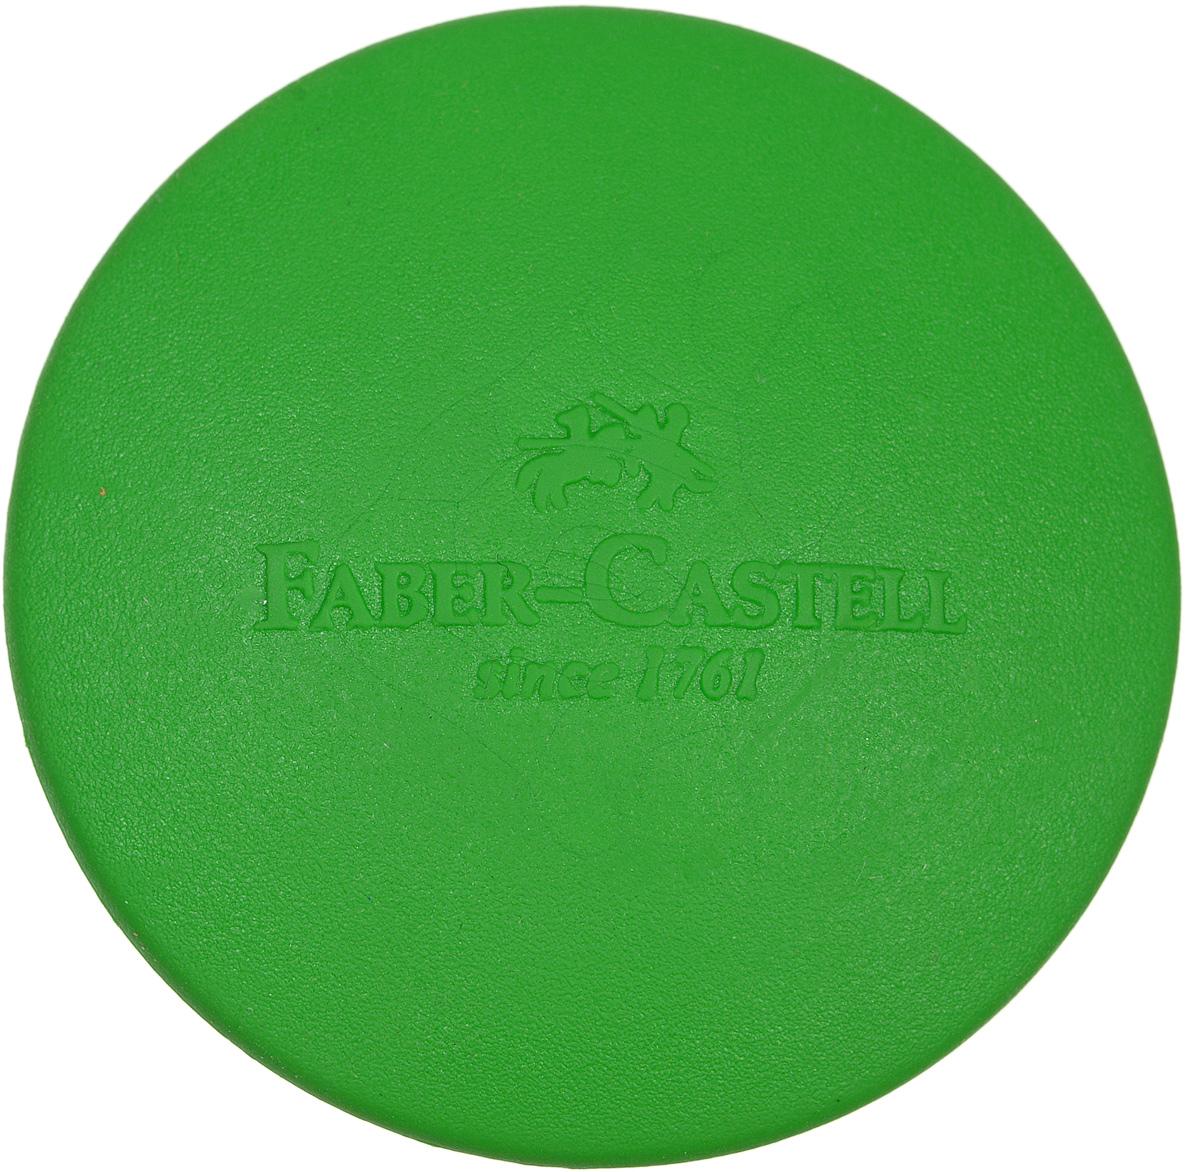 Faber-Castell Ластик цвет зеленый 589022_зеленый